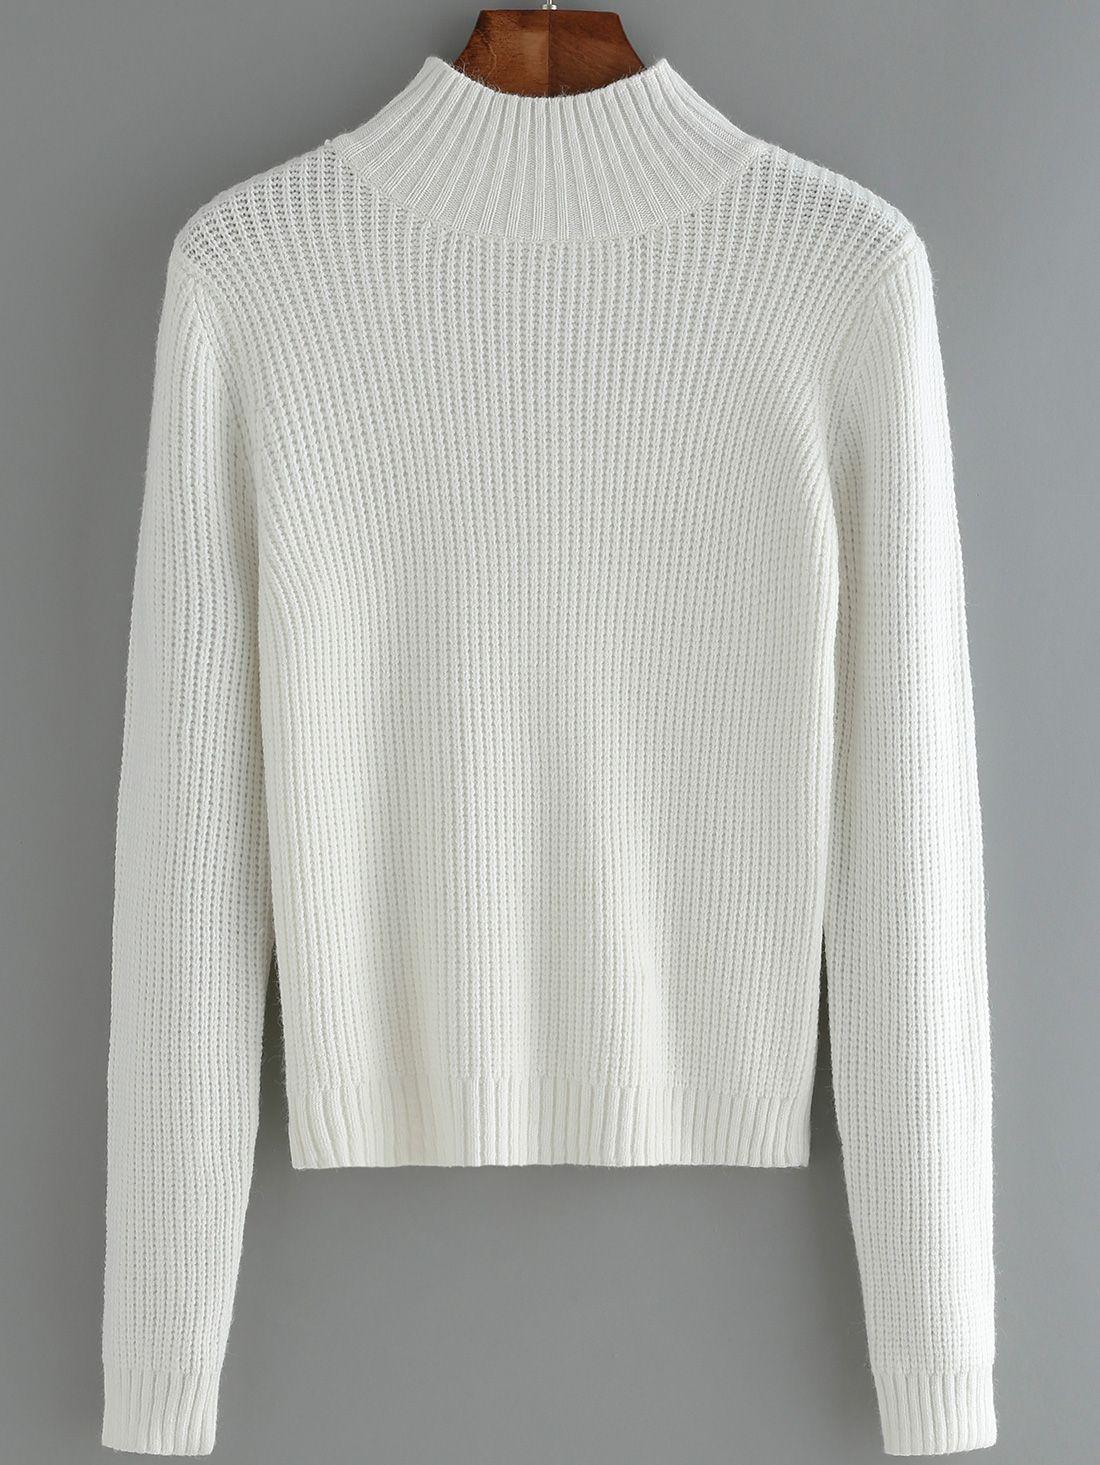 Women Mock Neck Slim White Sweater 18.00   Fashion pics ...